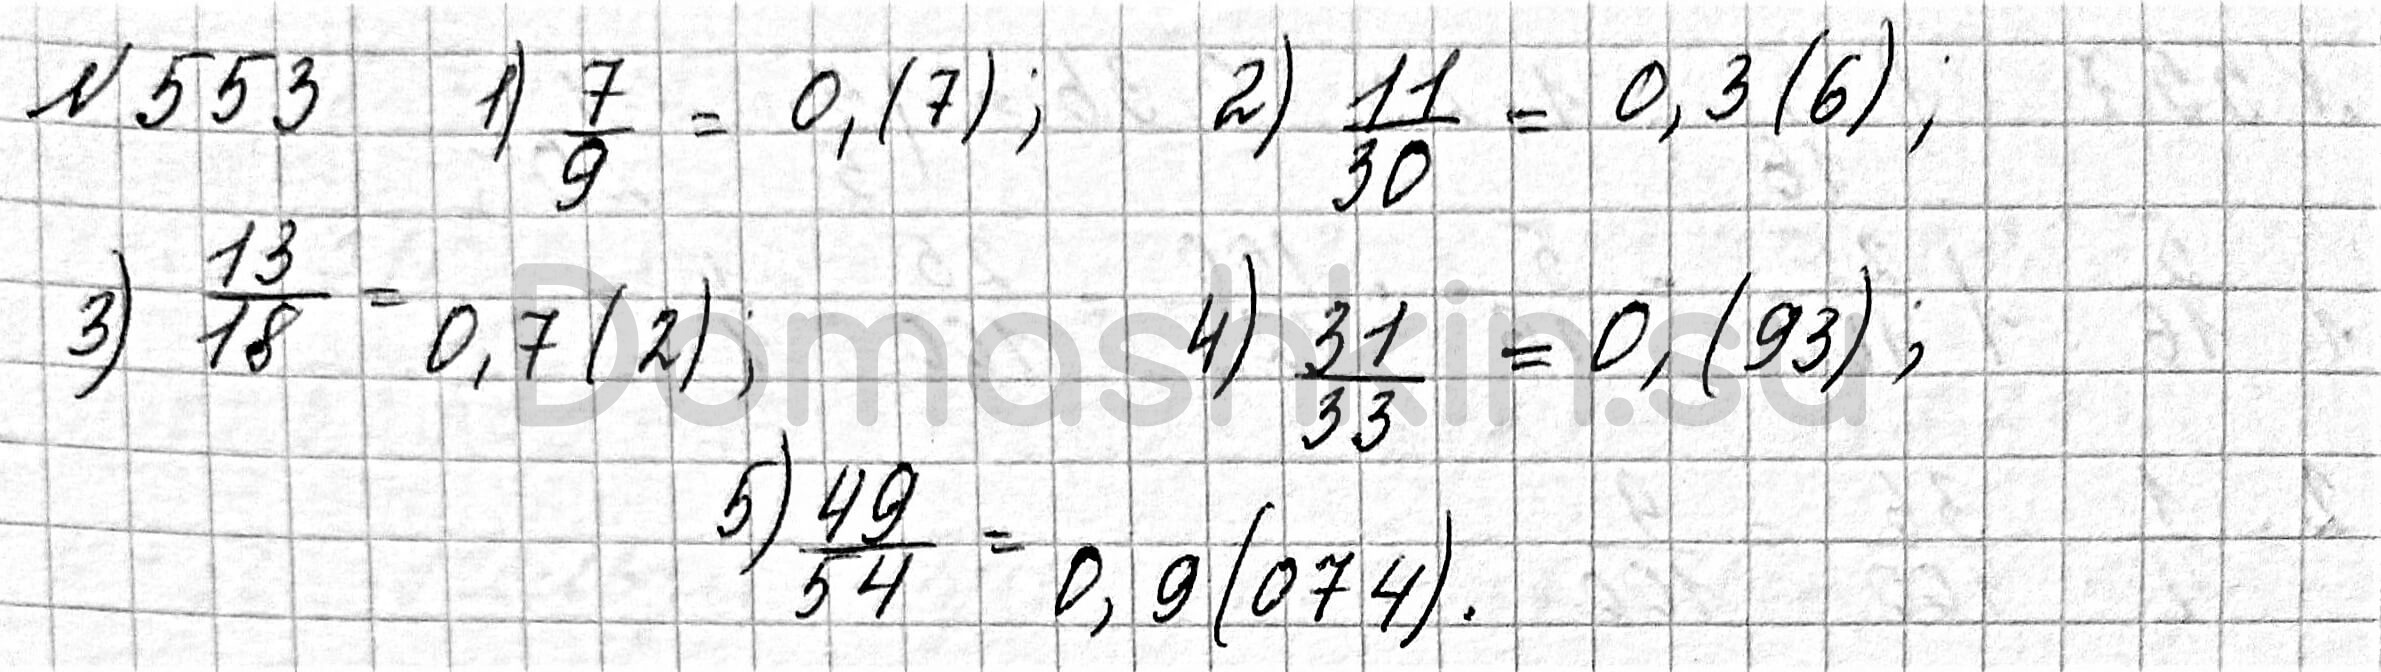 Математика 6 класс учебник Мерзляк номер 553 решение